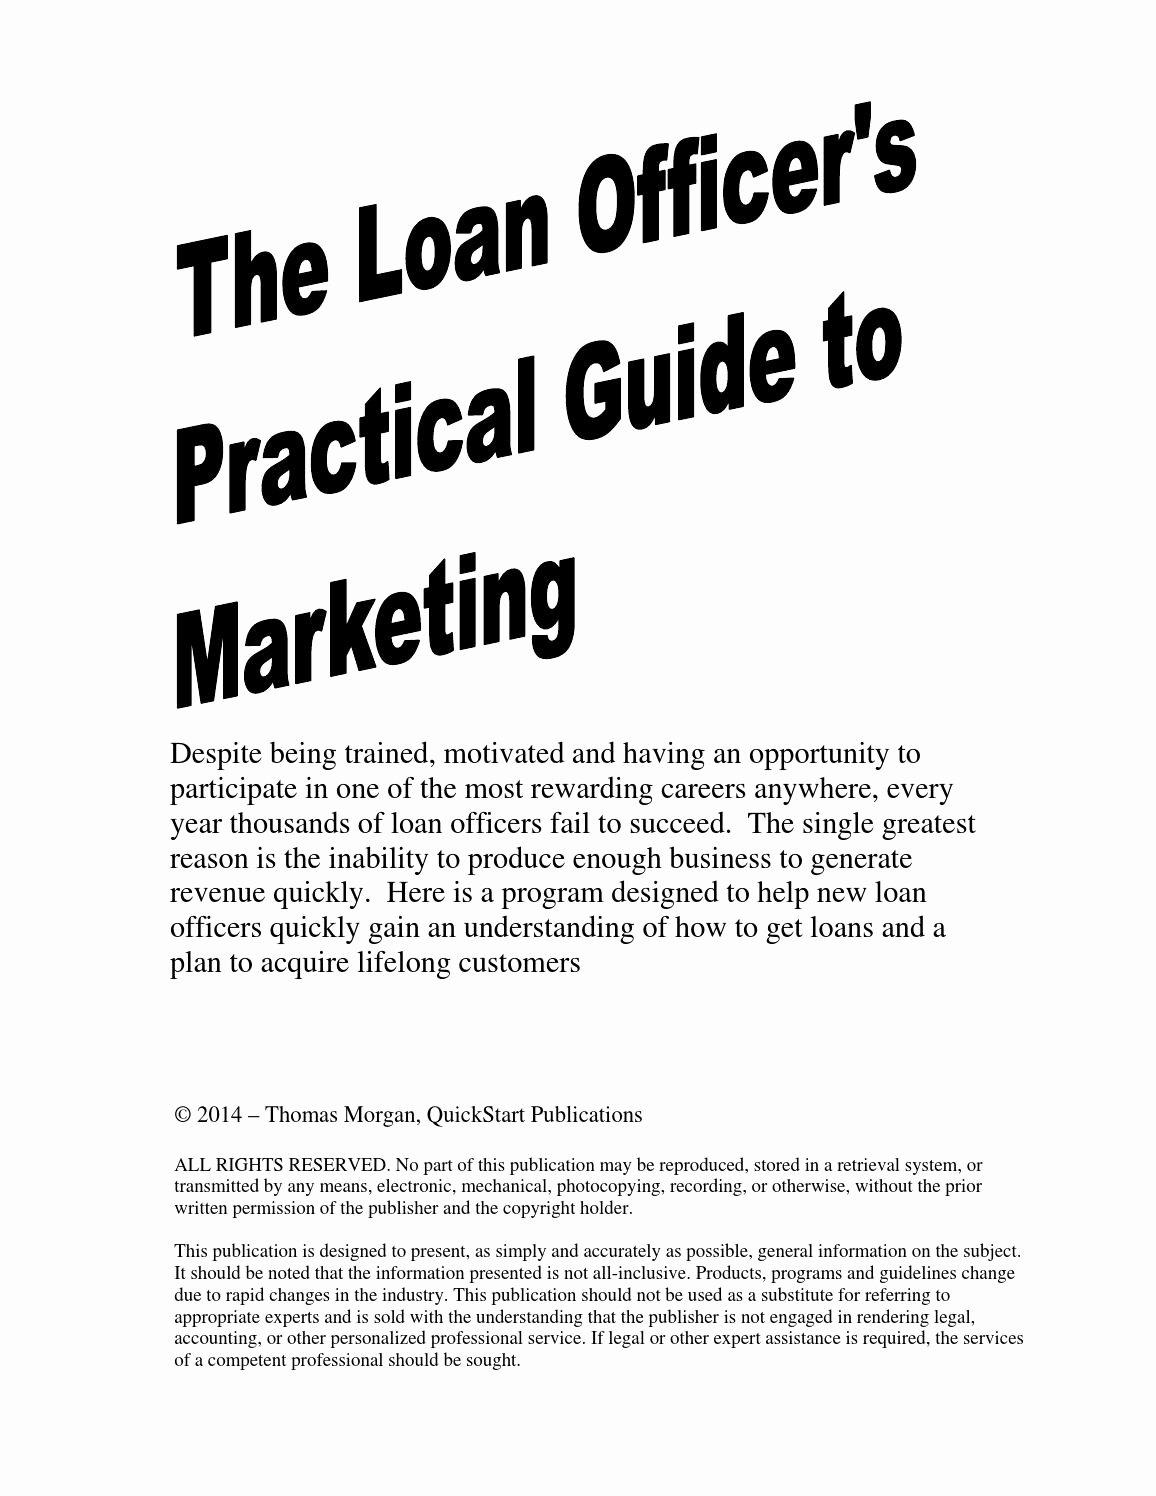 Loan Officer Marketing Plan Template Inspirational Loan Ficer Marketing Guide Preview by Quickstart